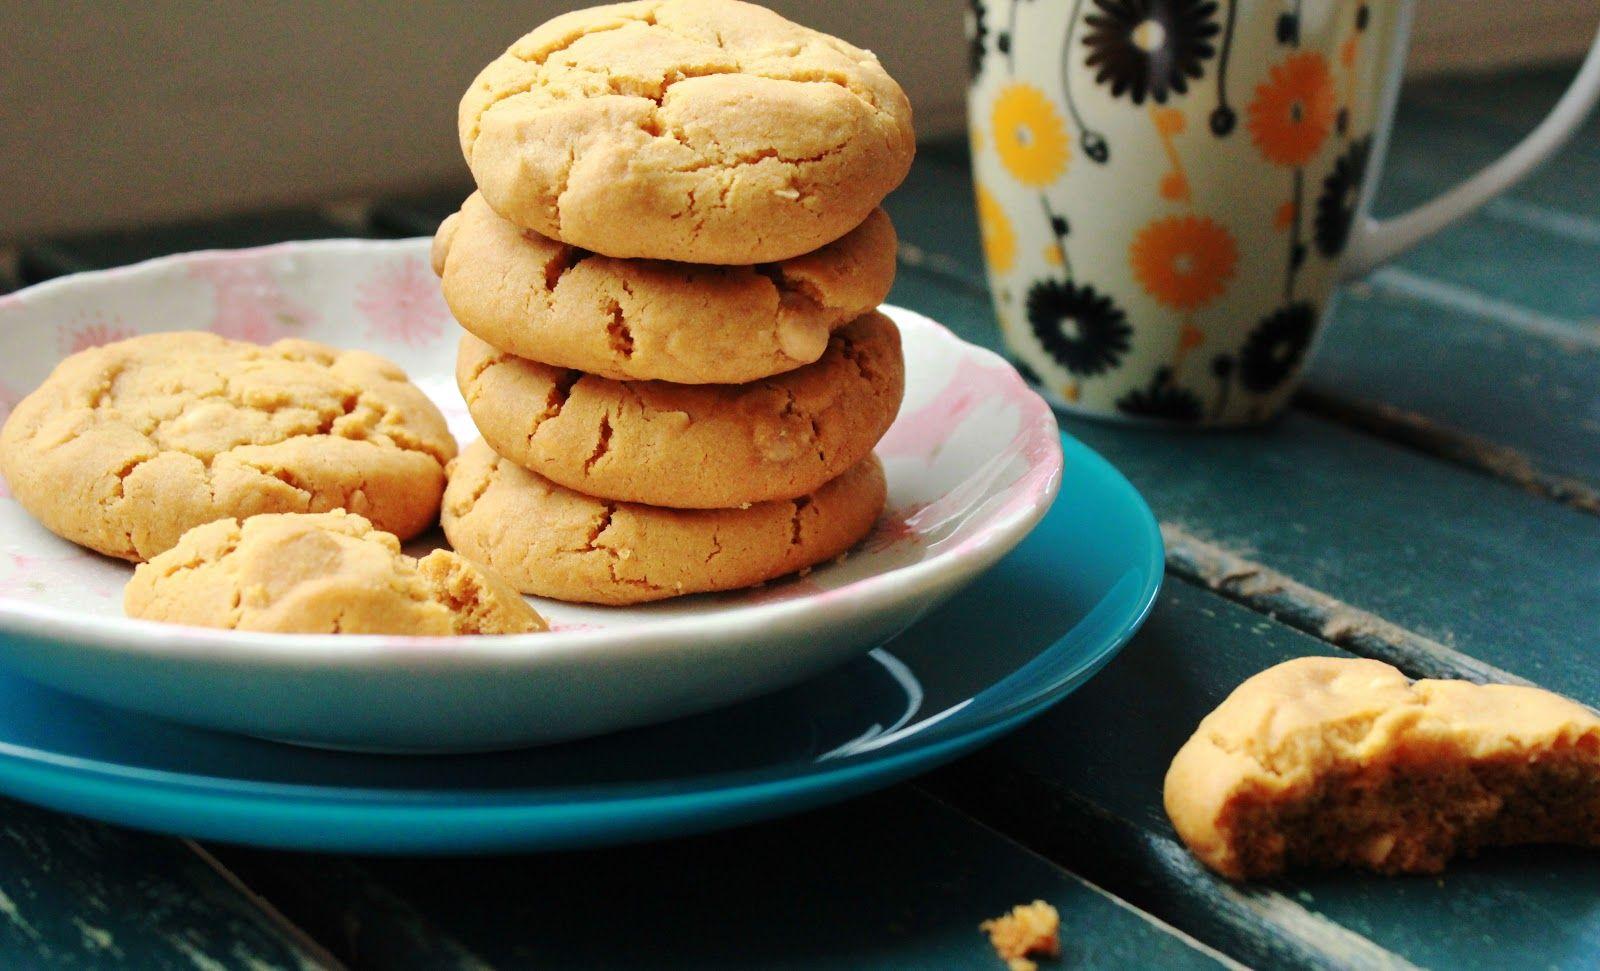 White chocolate and Macadamia Caramel Cookies. - Sugar et al